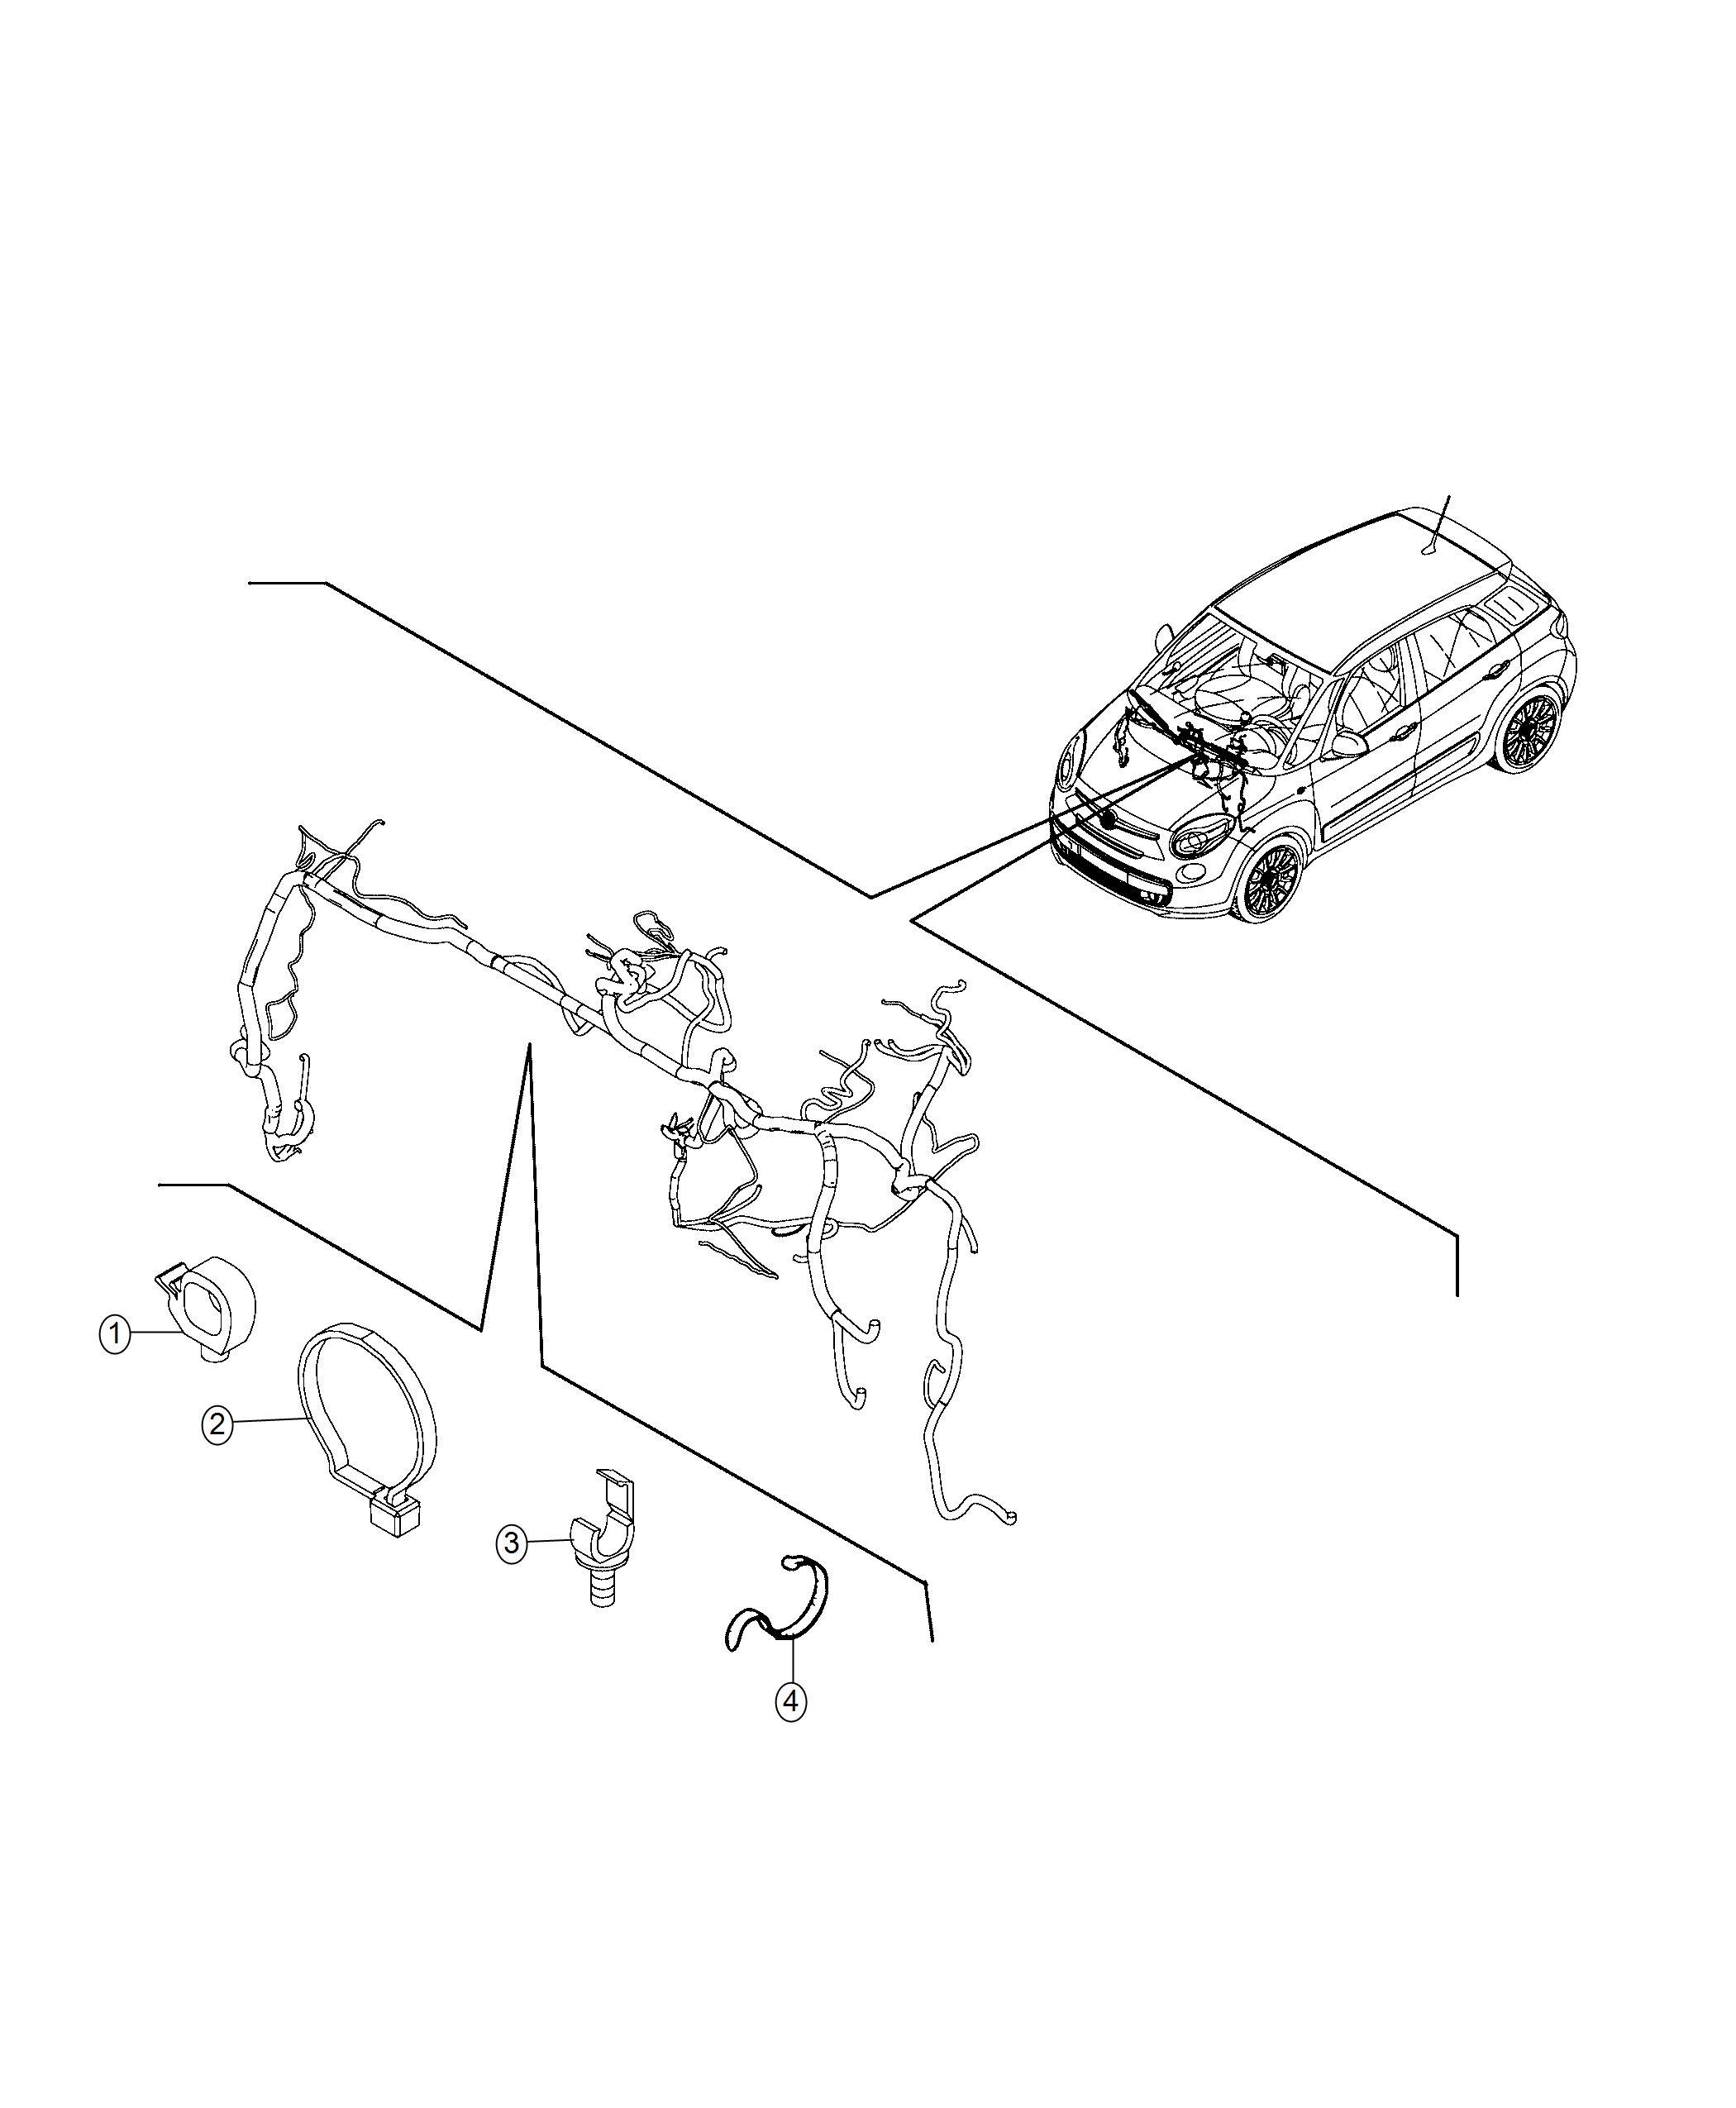 Fiat 500l Strap Tie Band Accessory Envelope